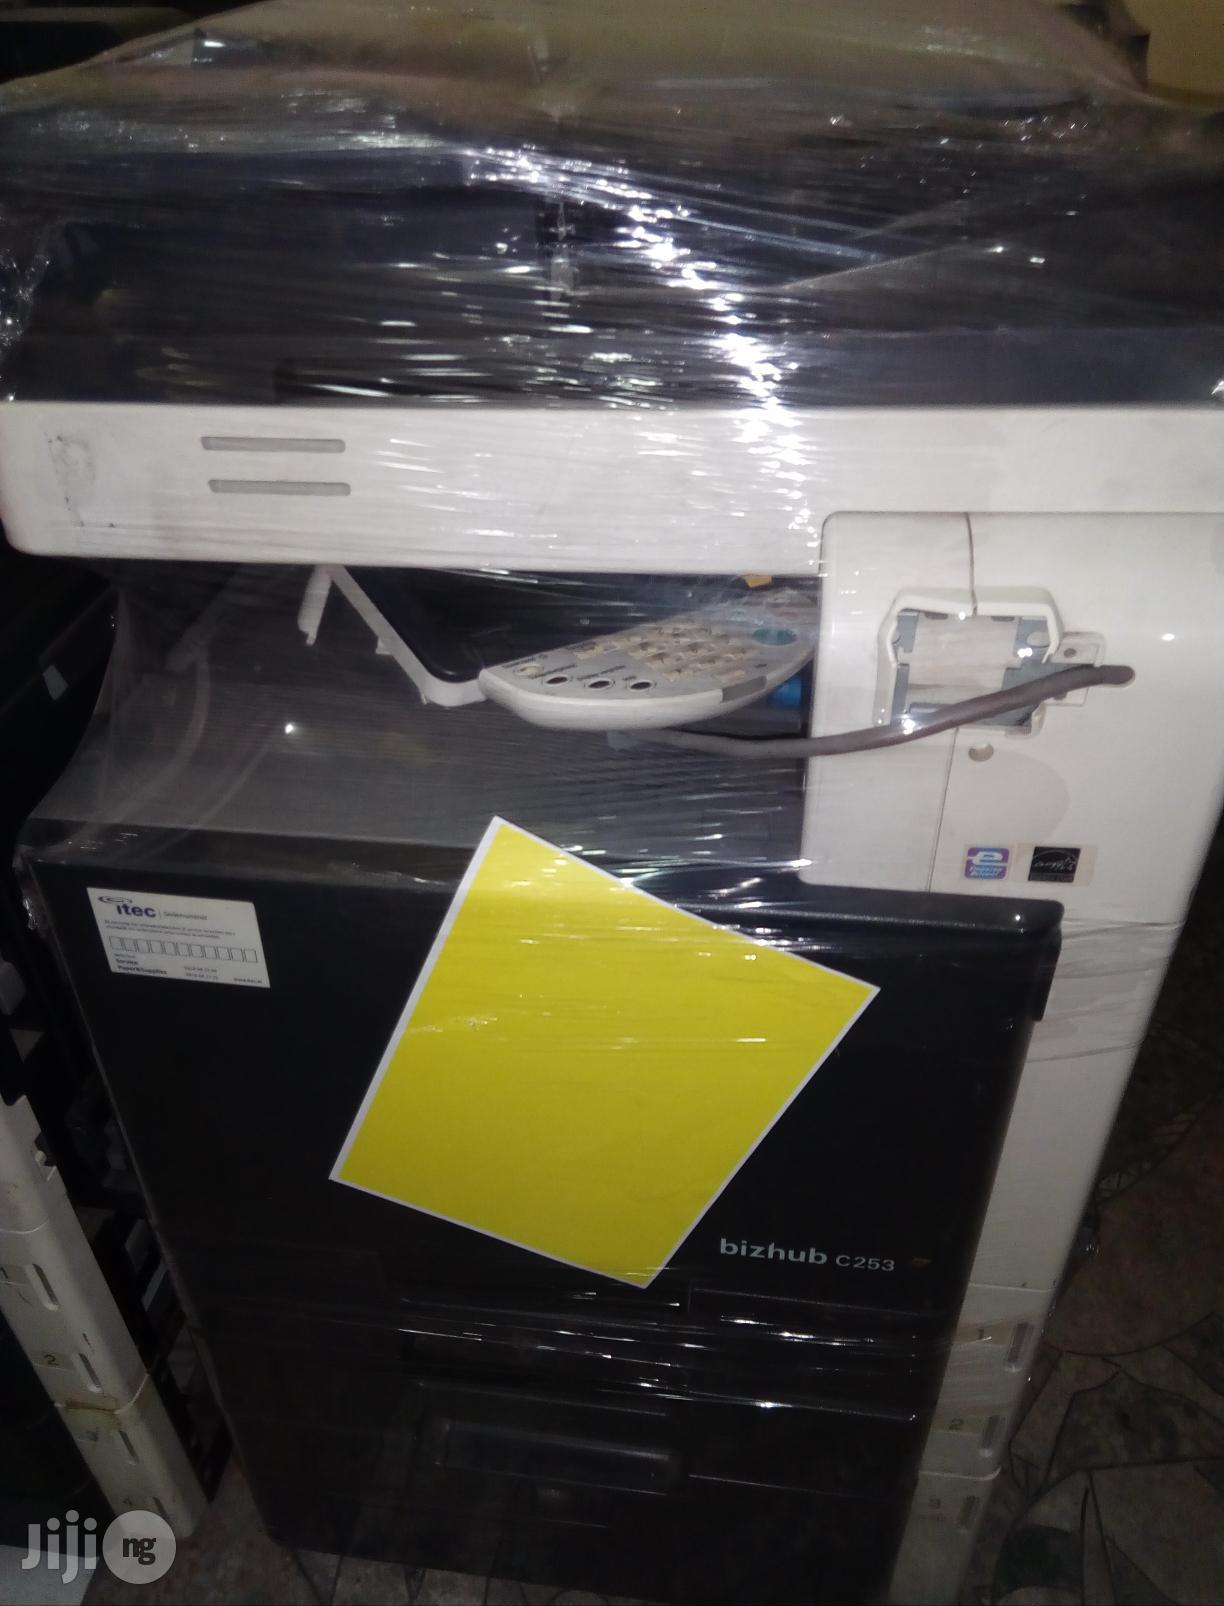 Konica Minolta Bizhub C253 Direct Image Printer/Photocopy | Printers & Scanners for sale in Surulere, Lagos State, Nigeria